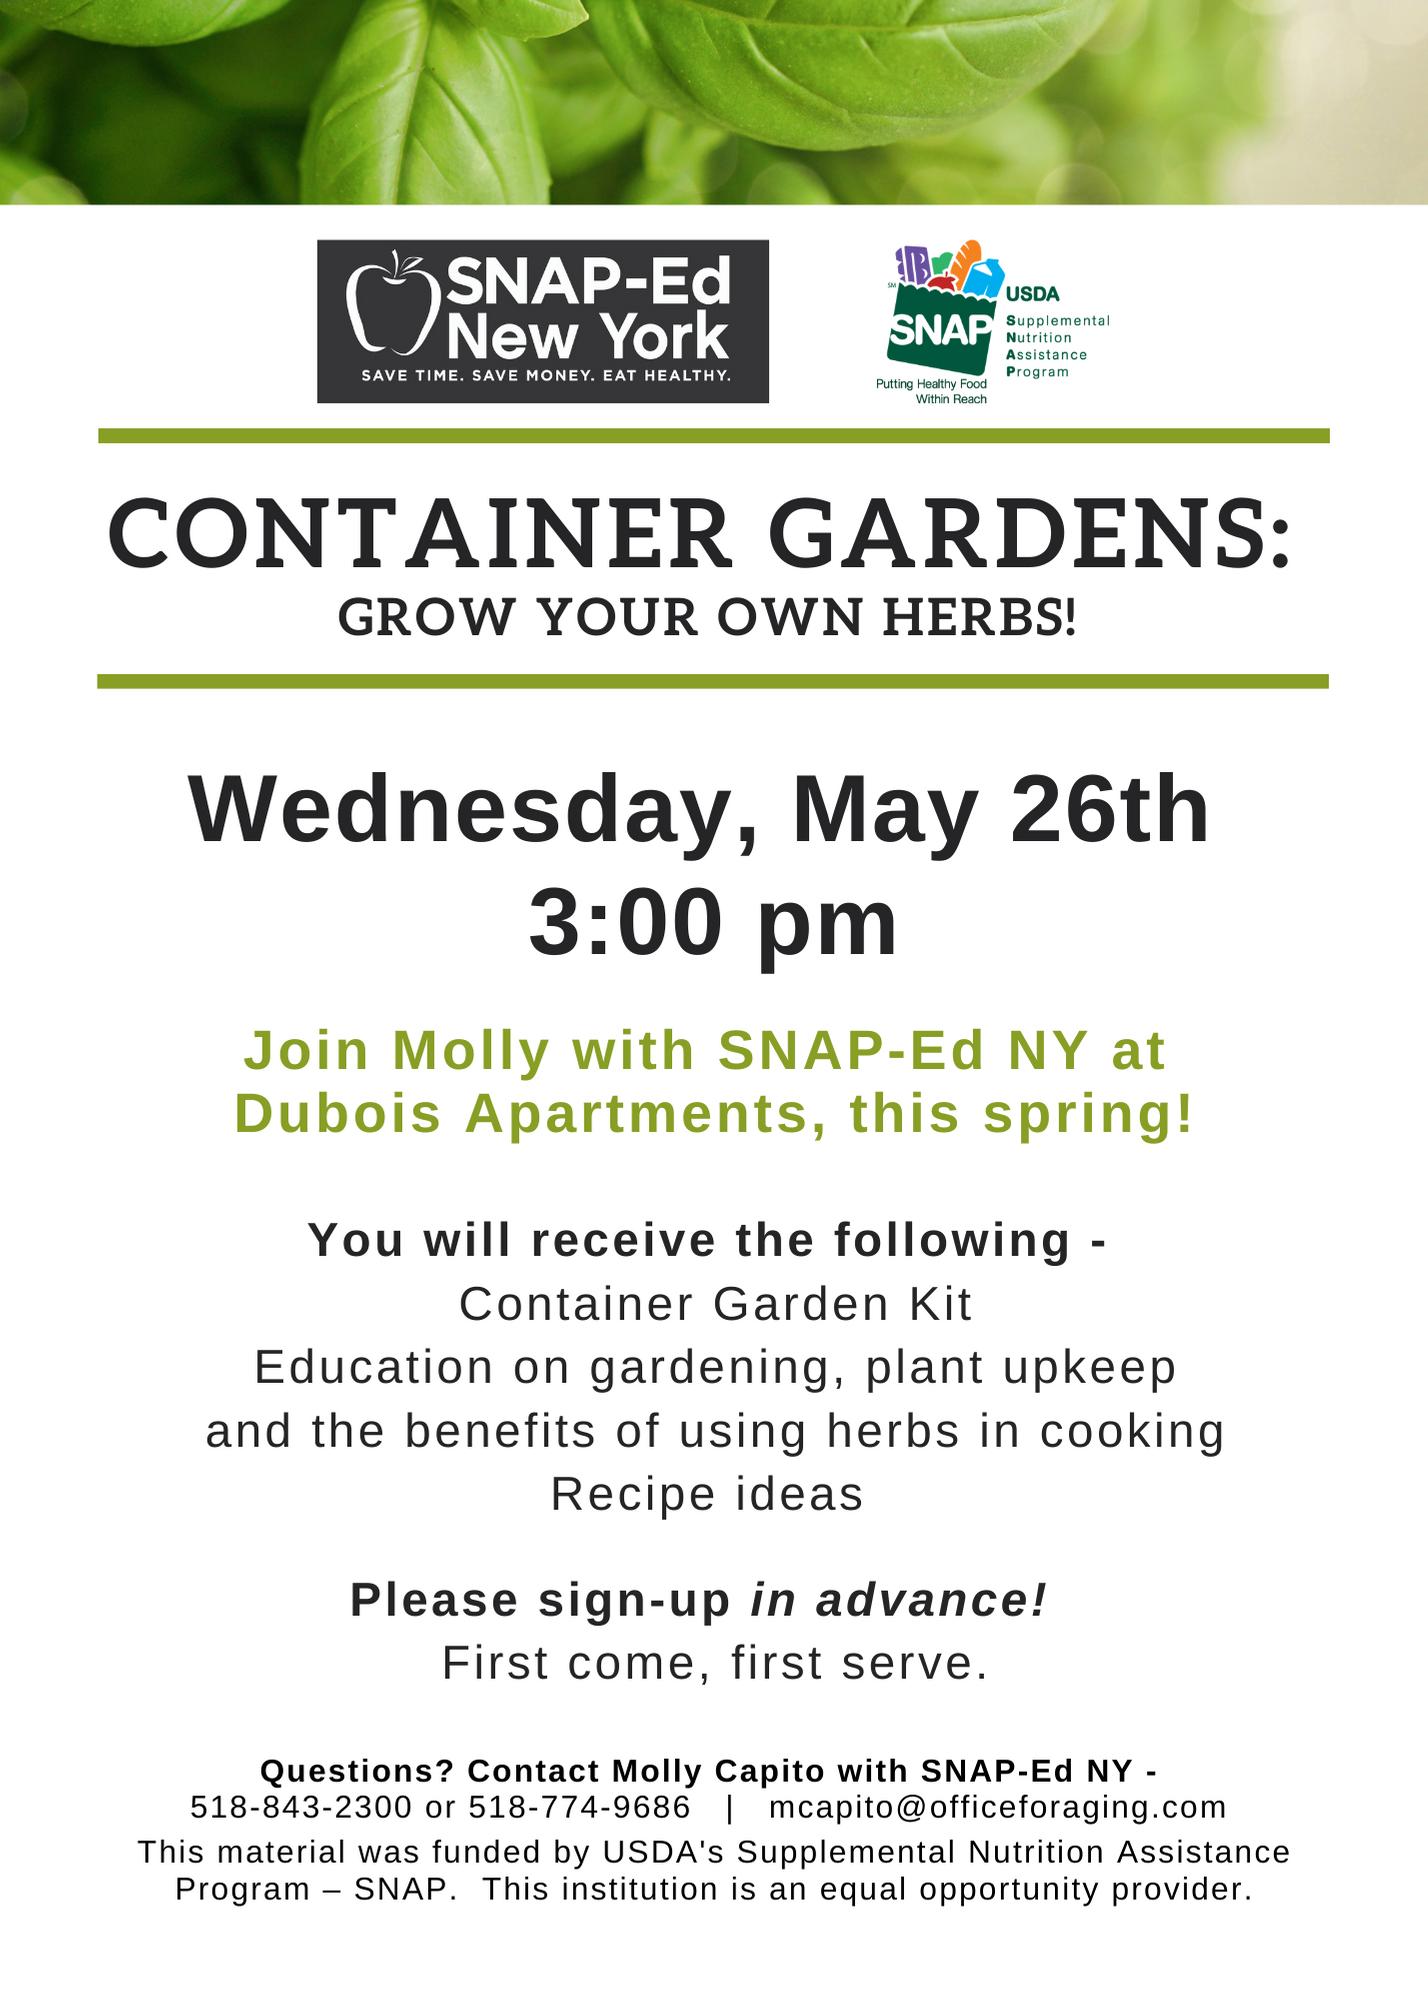 Container Gardens Dubois